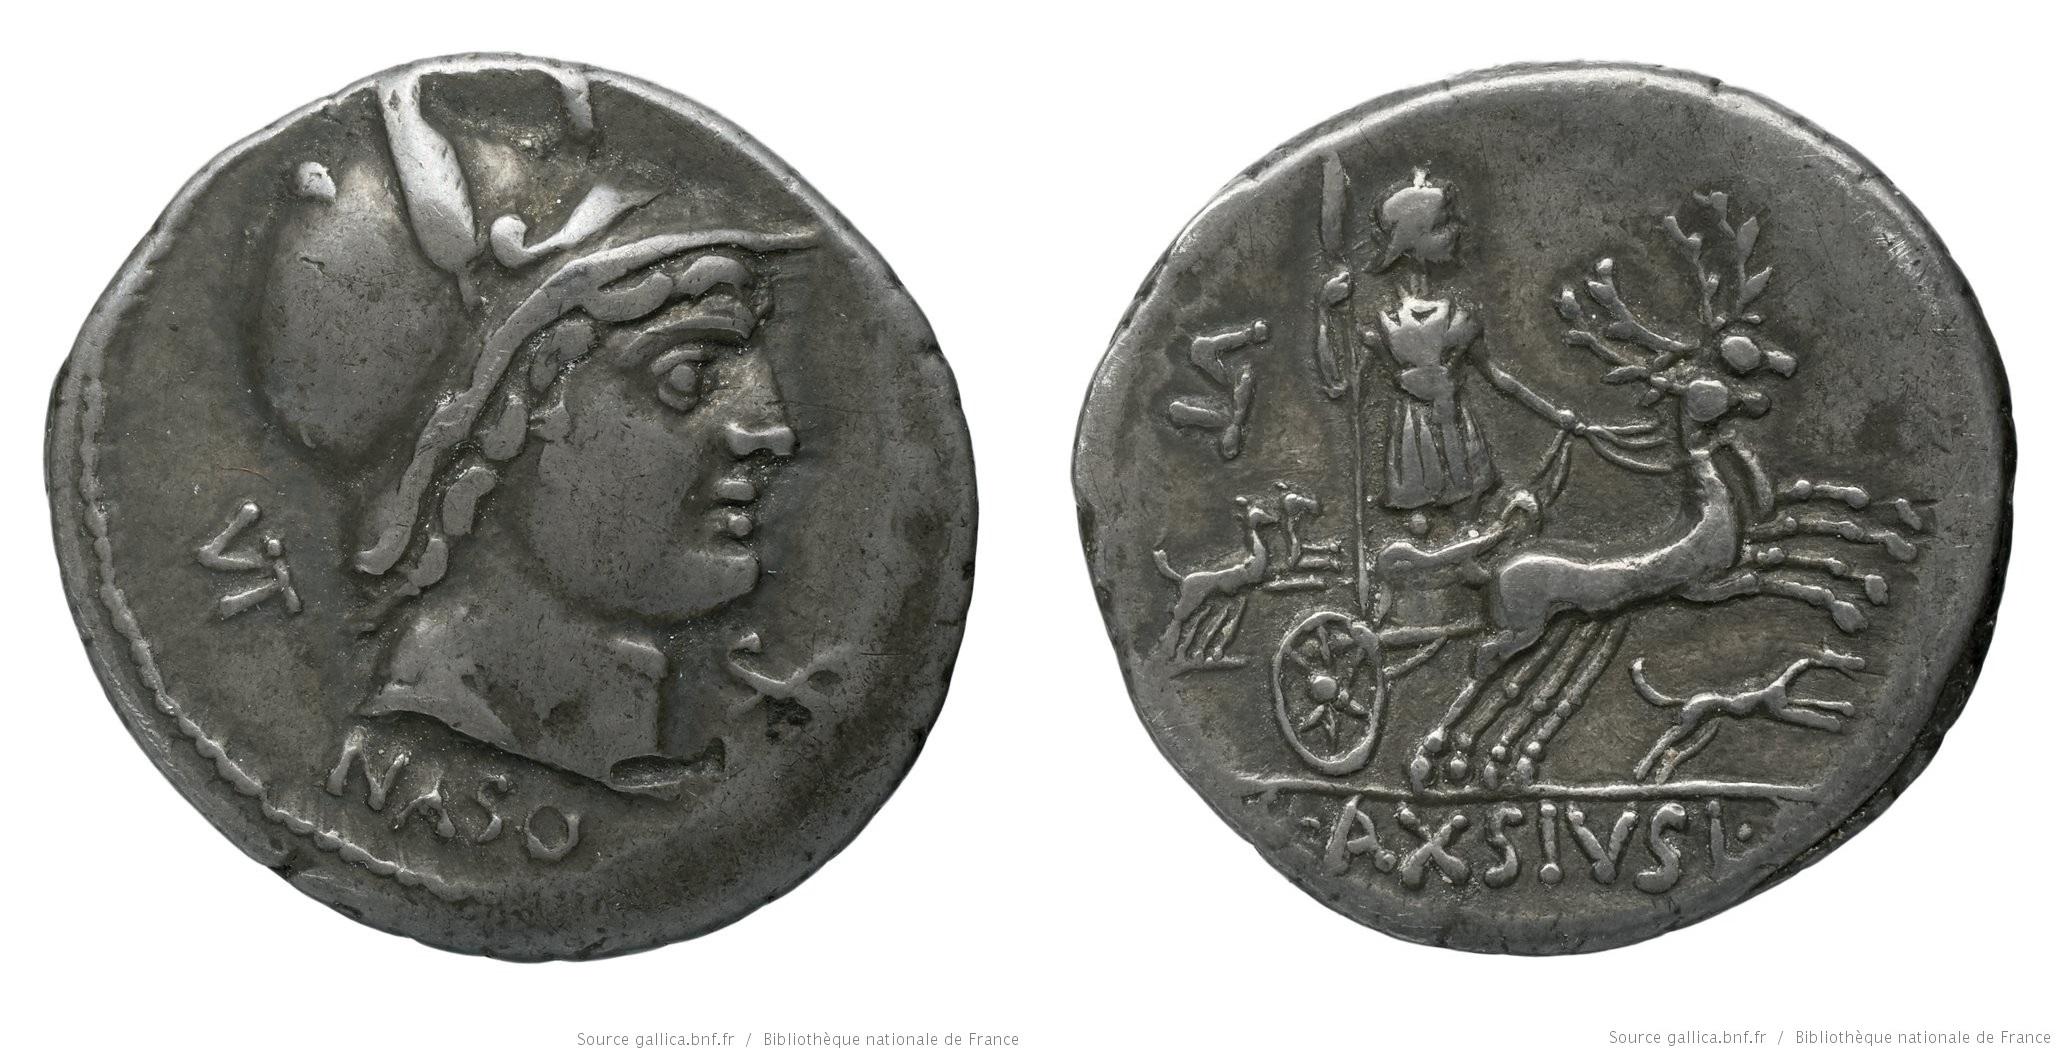 1343AX – Denier Axia – Lucius Axsius Naso